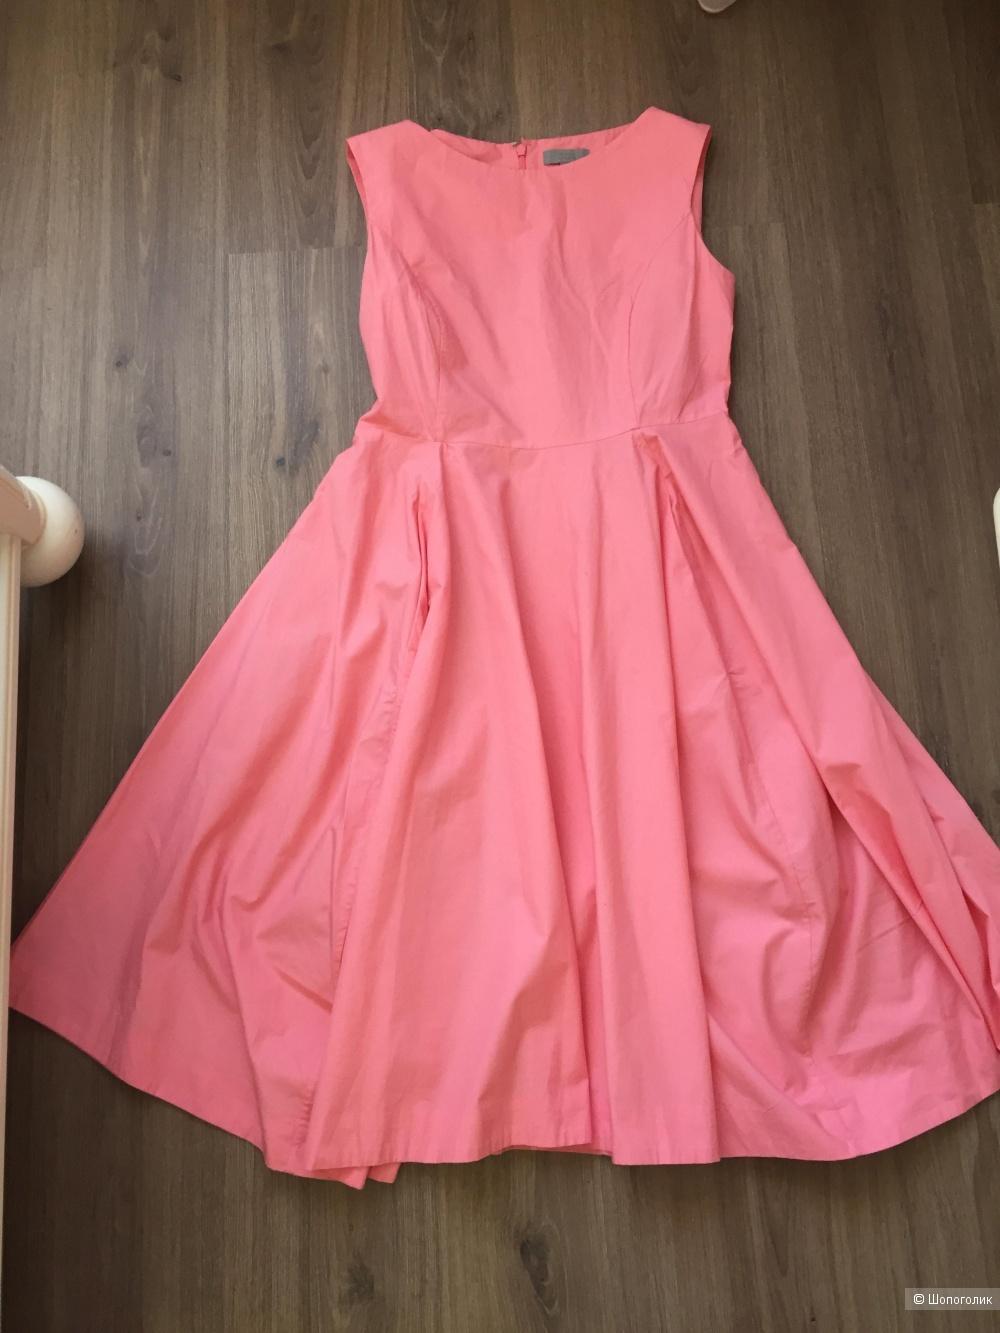 Cos платье M